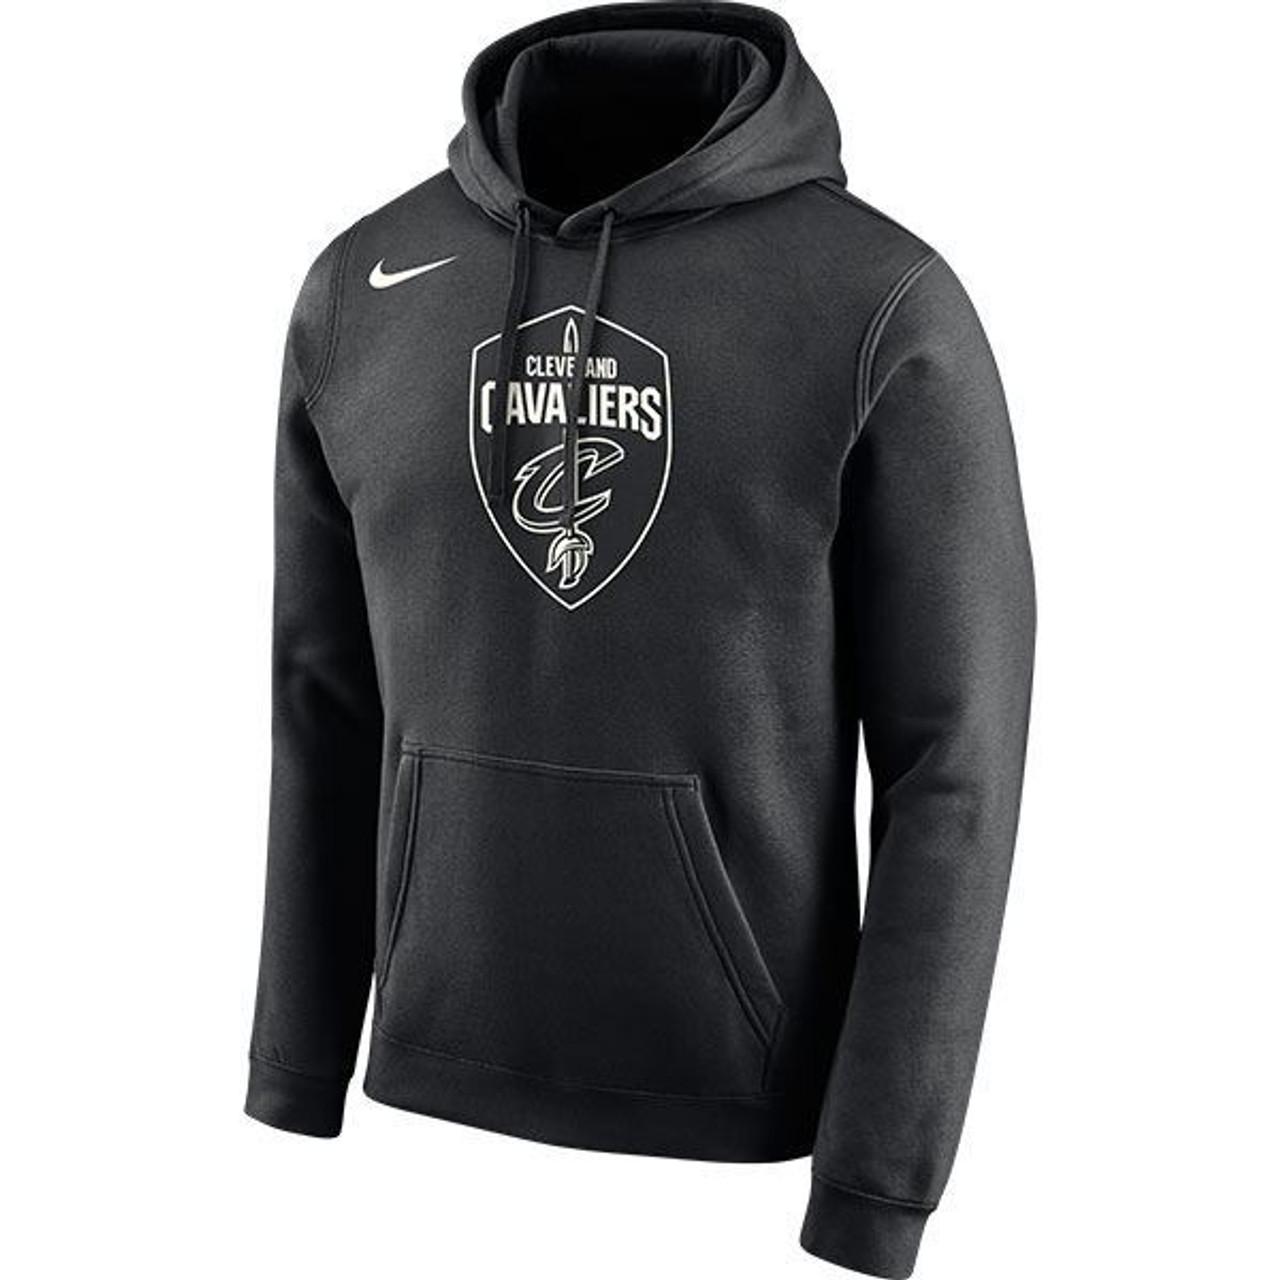 c3a08e48ea5b Nike Black   White Global Shield Hoodie - Cleveland Cavaliers